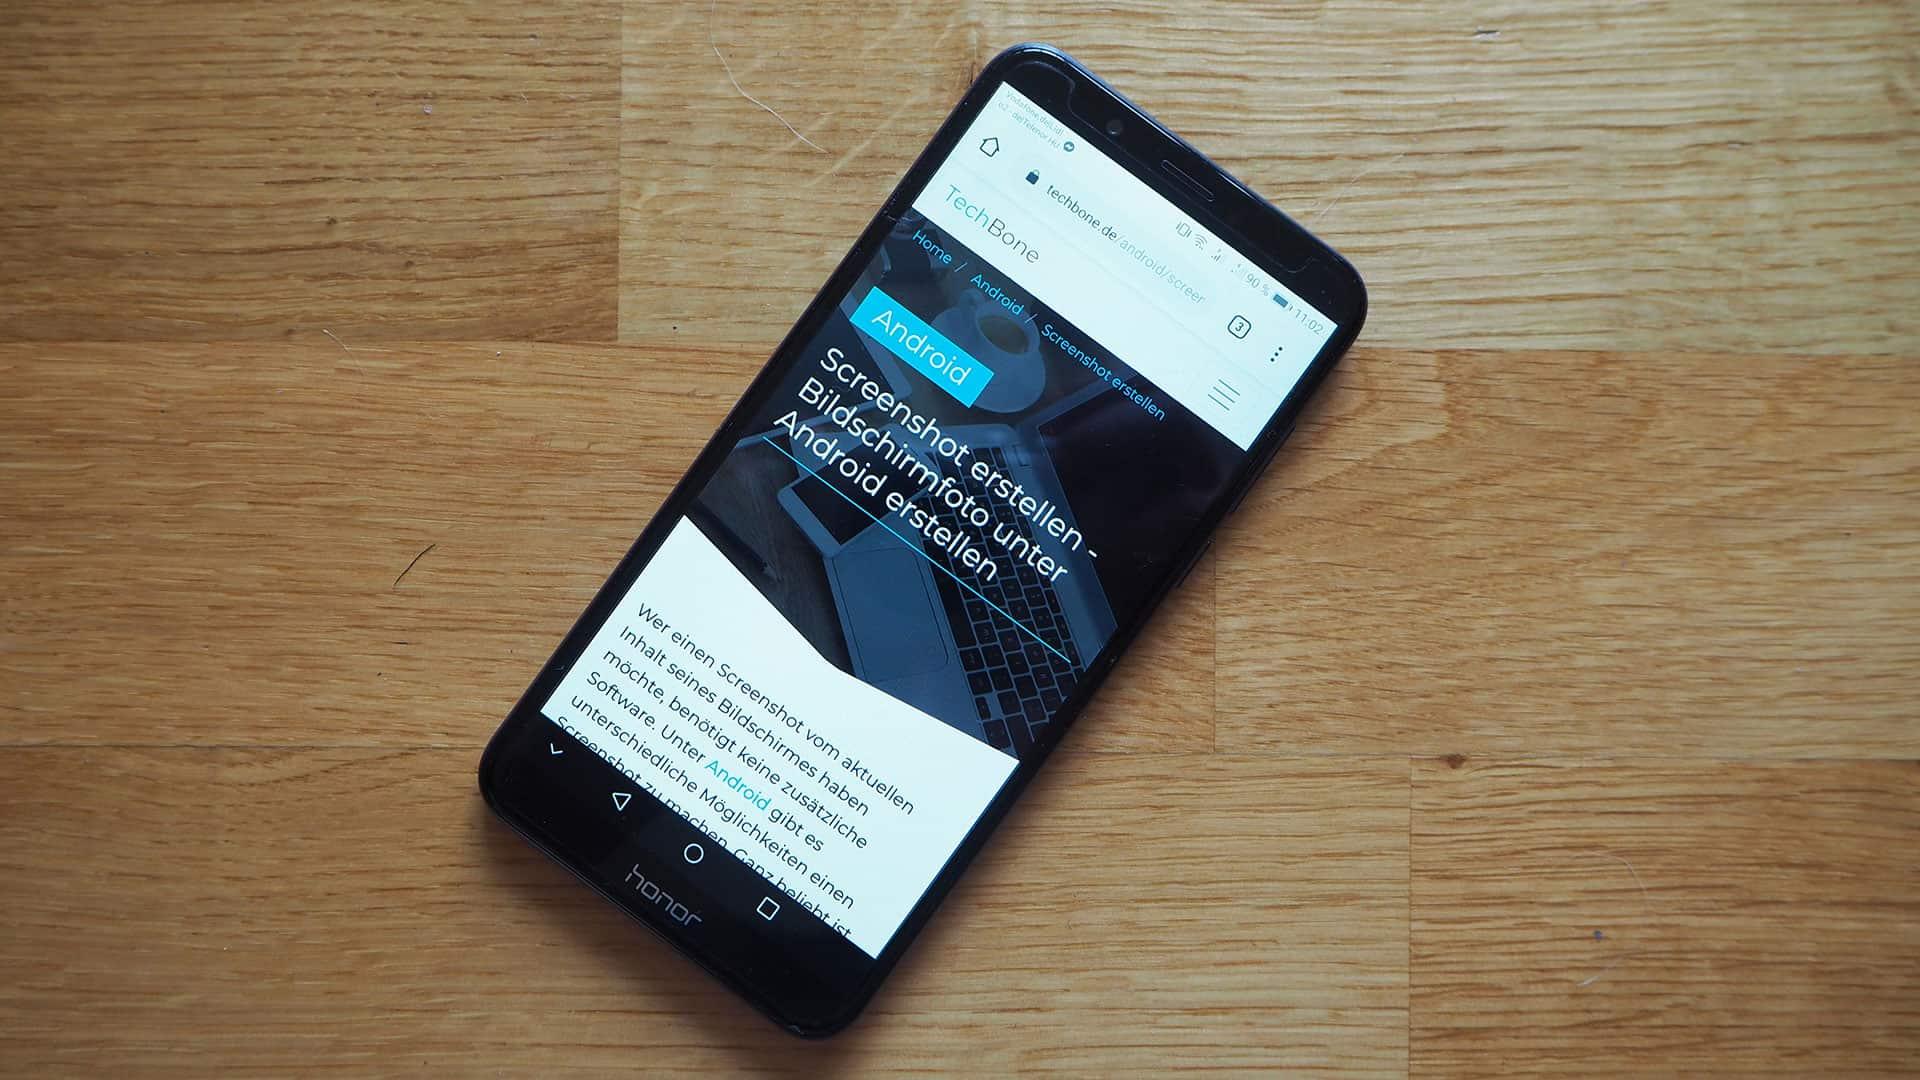 Screenshot erstellen - Bildschirmfoto unter Android erstellen